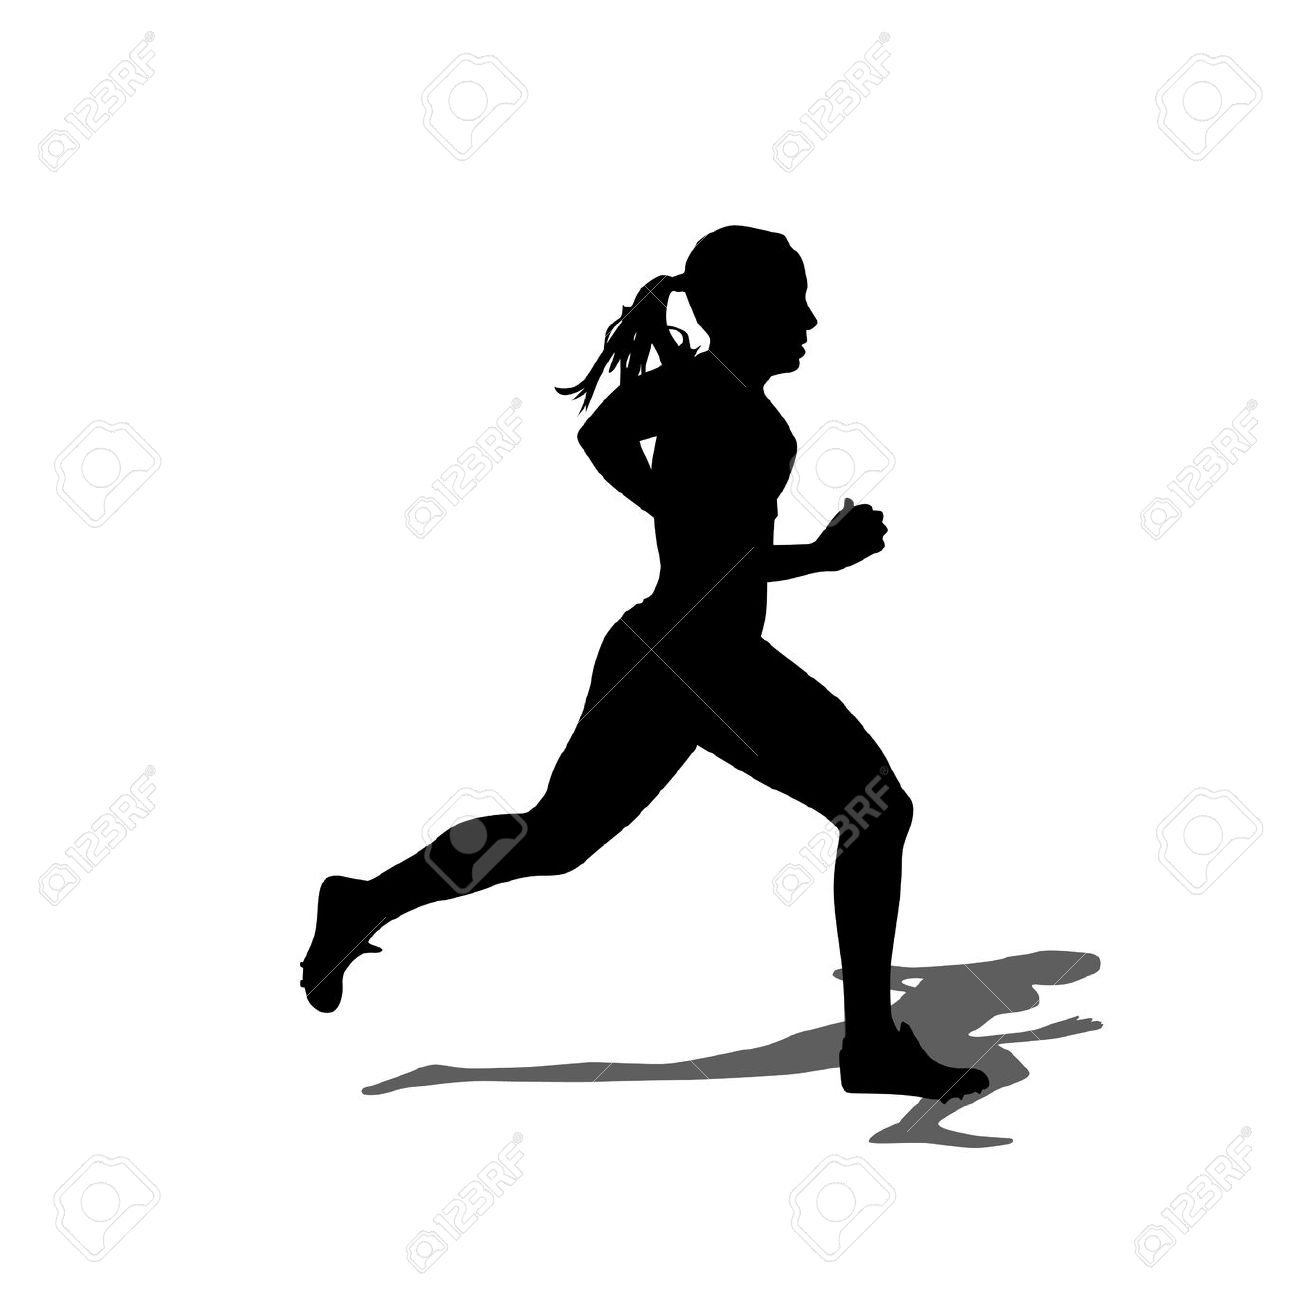 Girl Running Silhouette at GetDrawings.com.